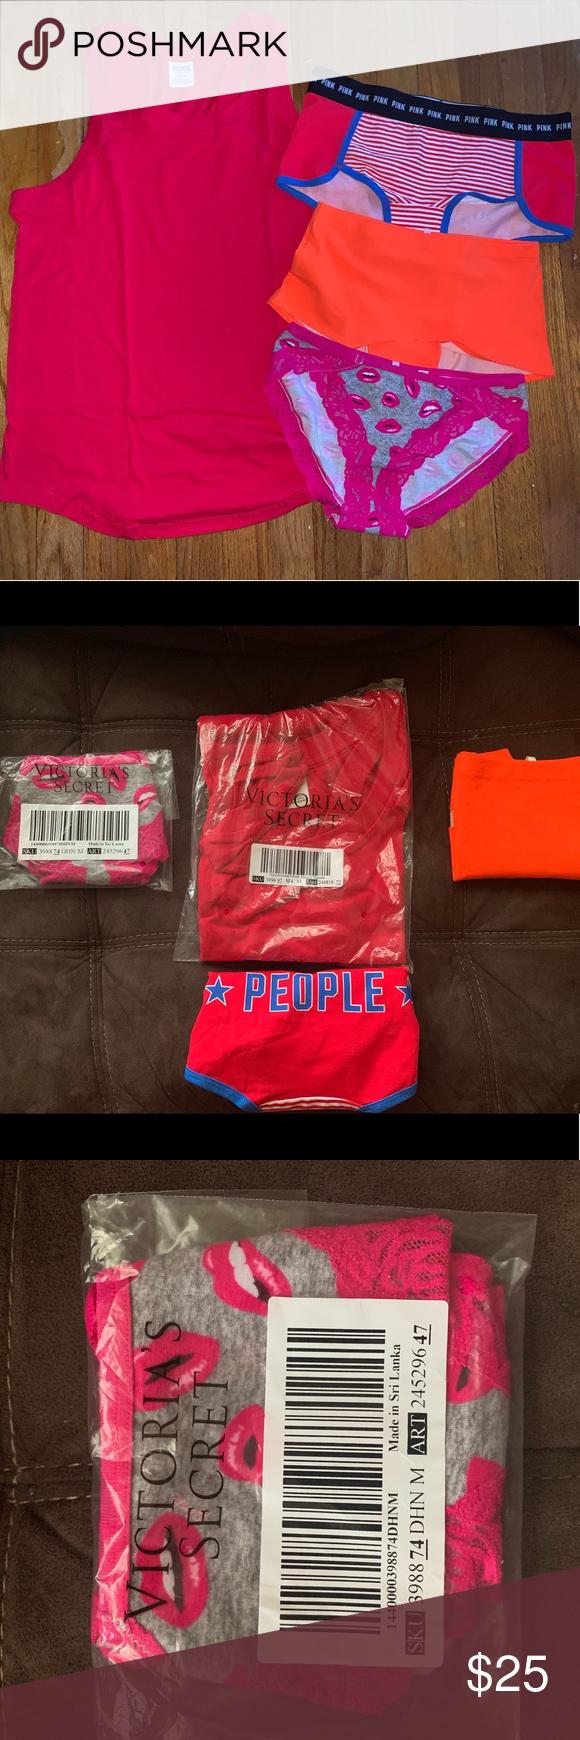 Victoria Secret Pink Bundle I put together these Pink items